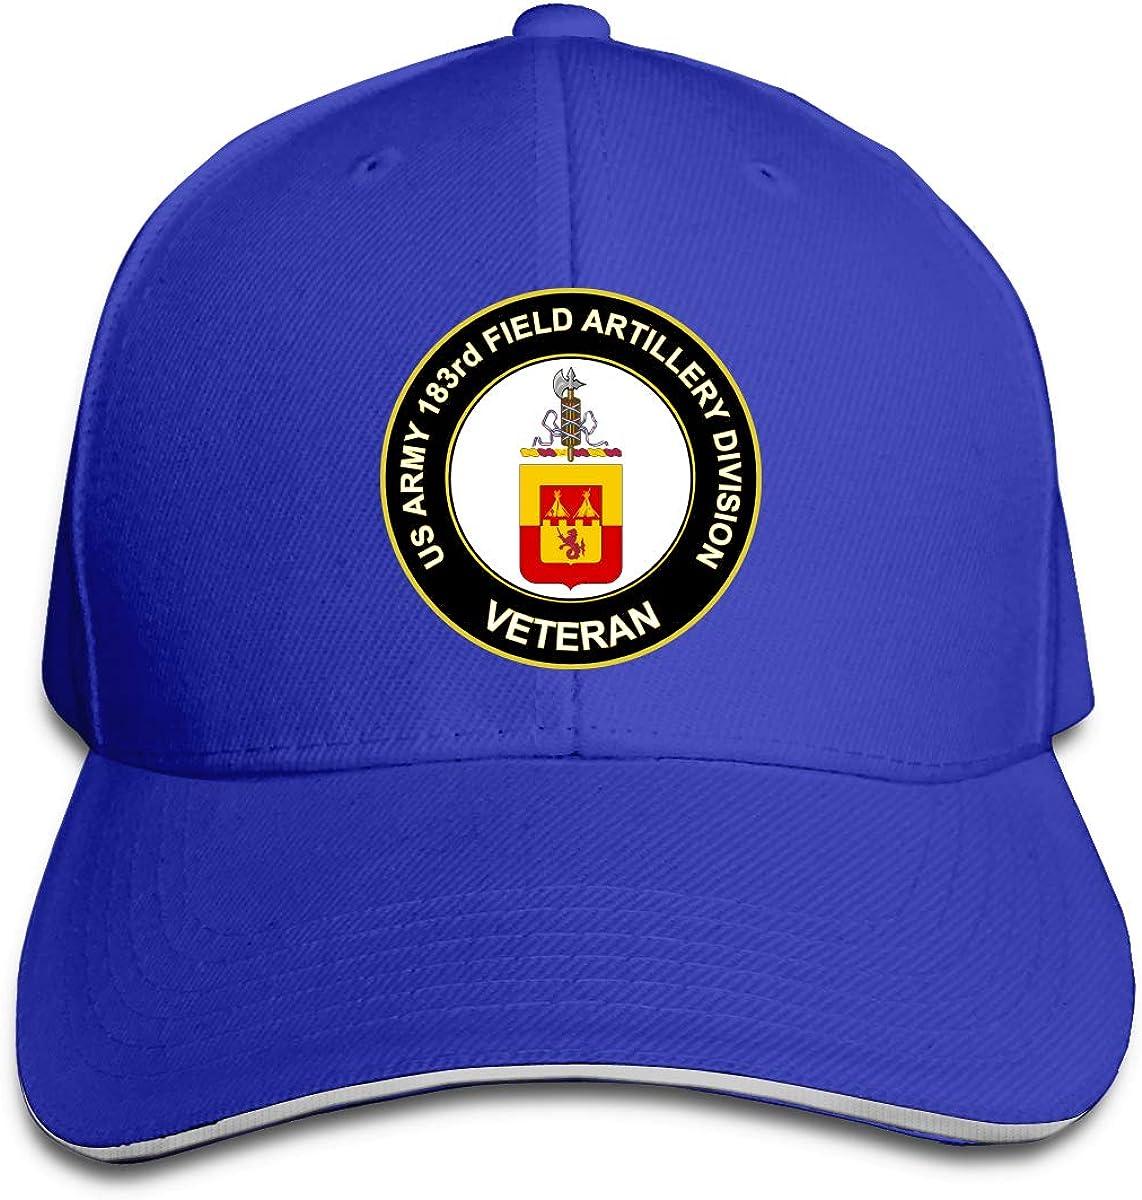 U.S Army Veteran 183rd Field Artillery Division Adjustable Baseball Caps Vintage Sandwich Cap